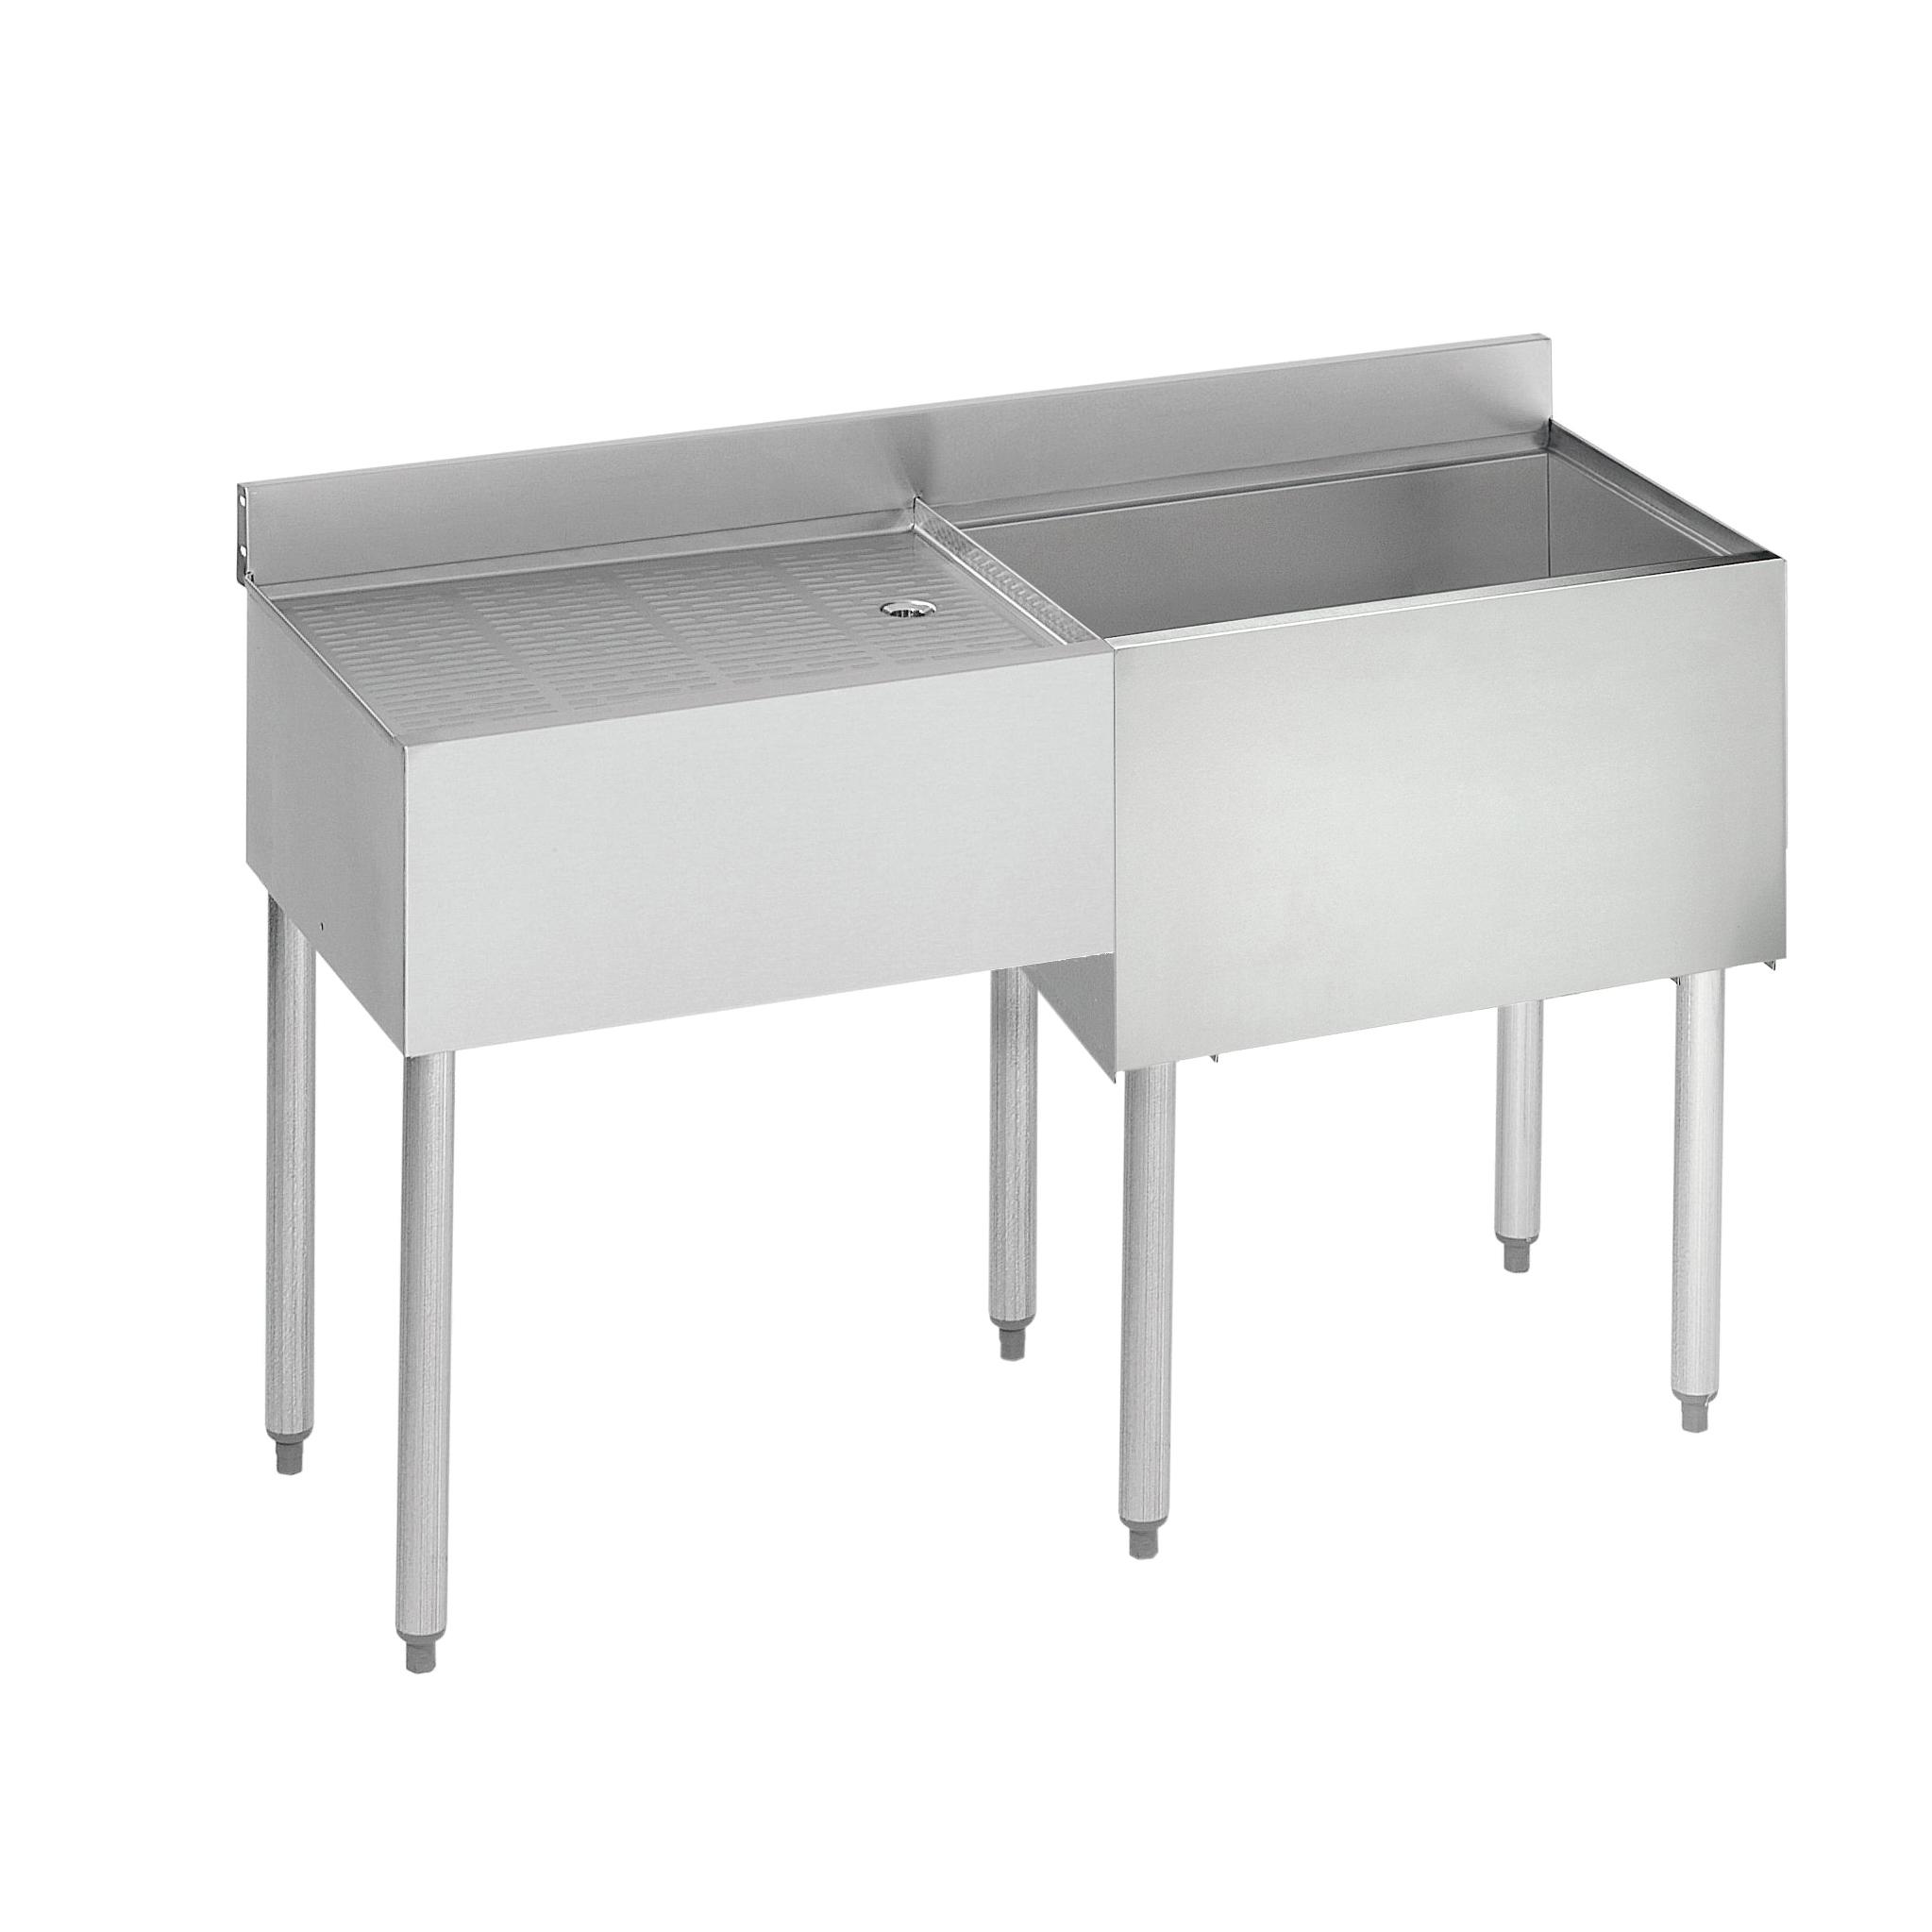 Krowne Metal 18-D48R-7 ice bin